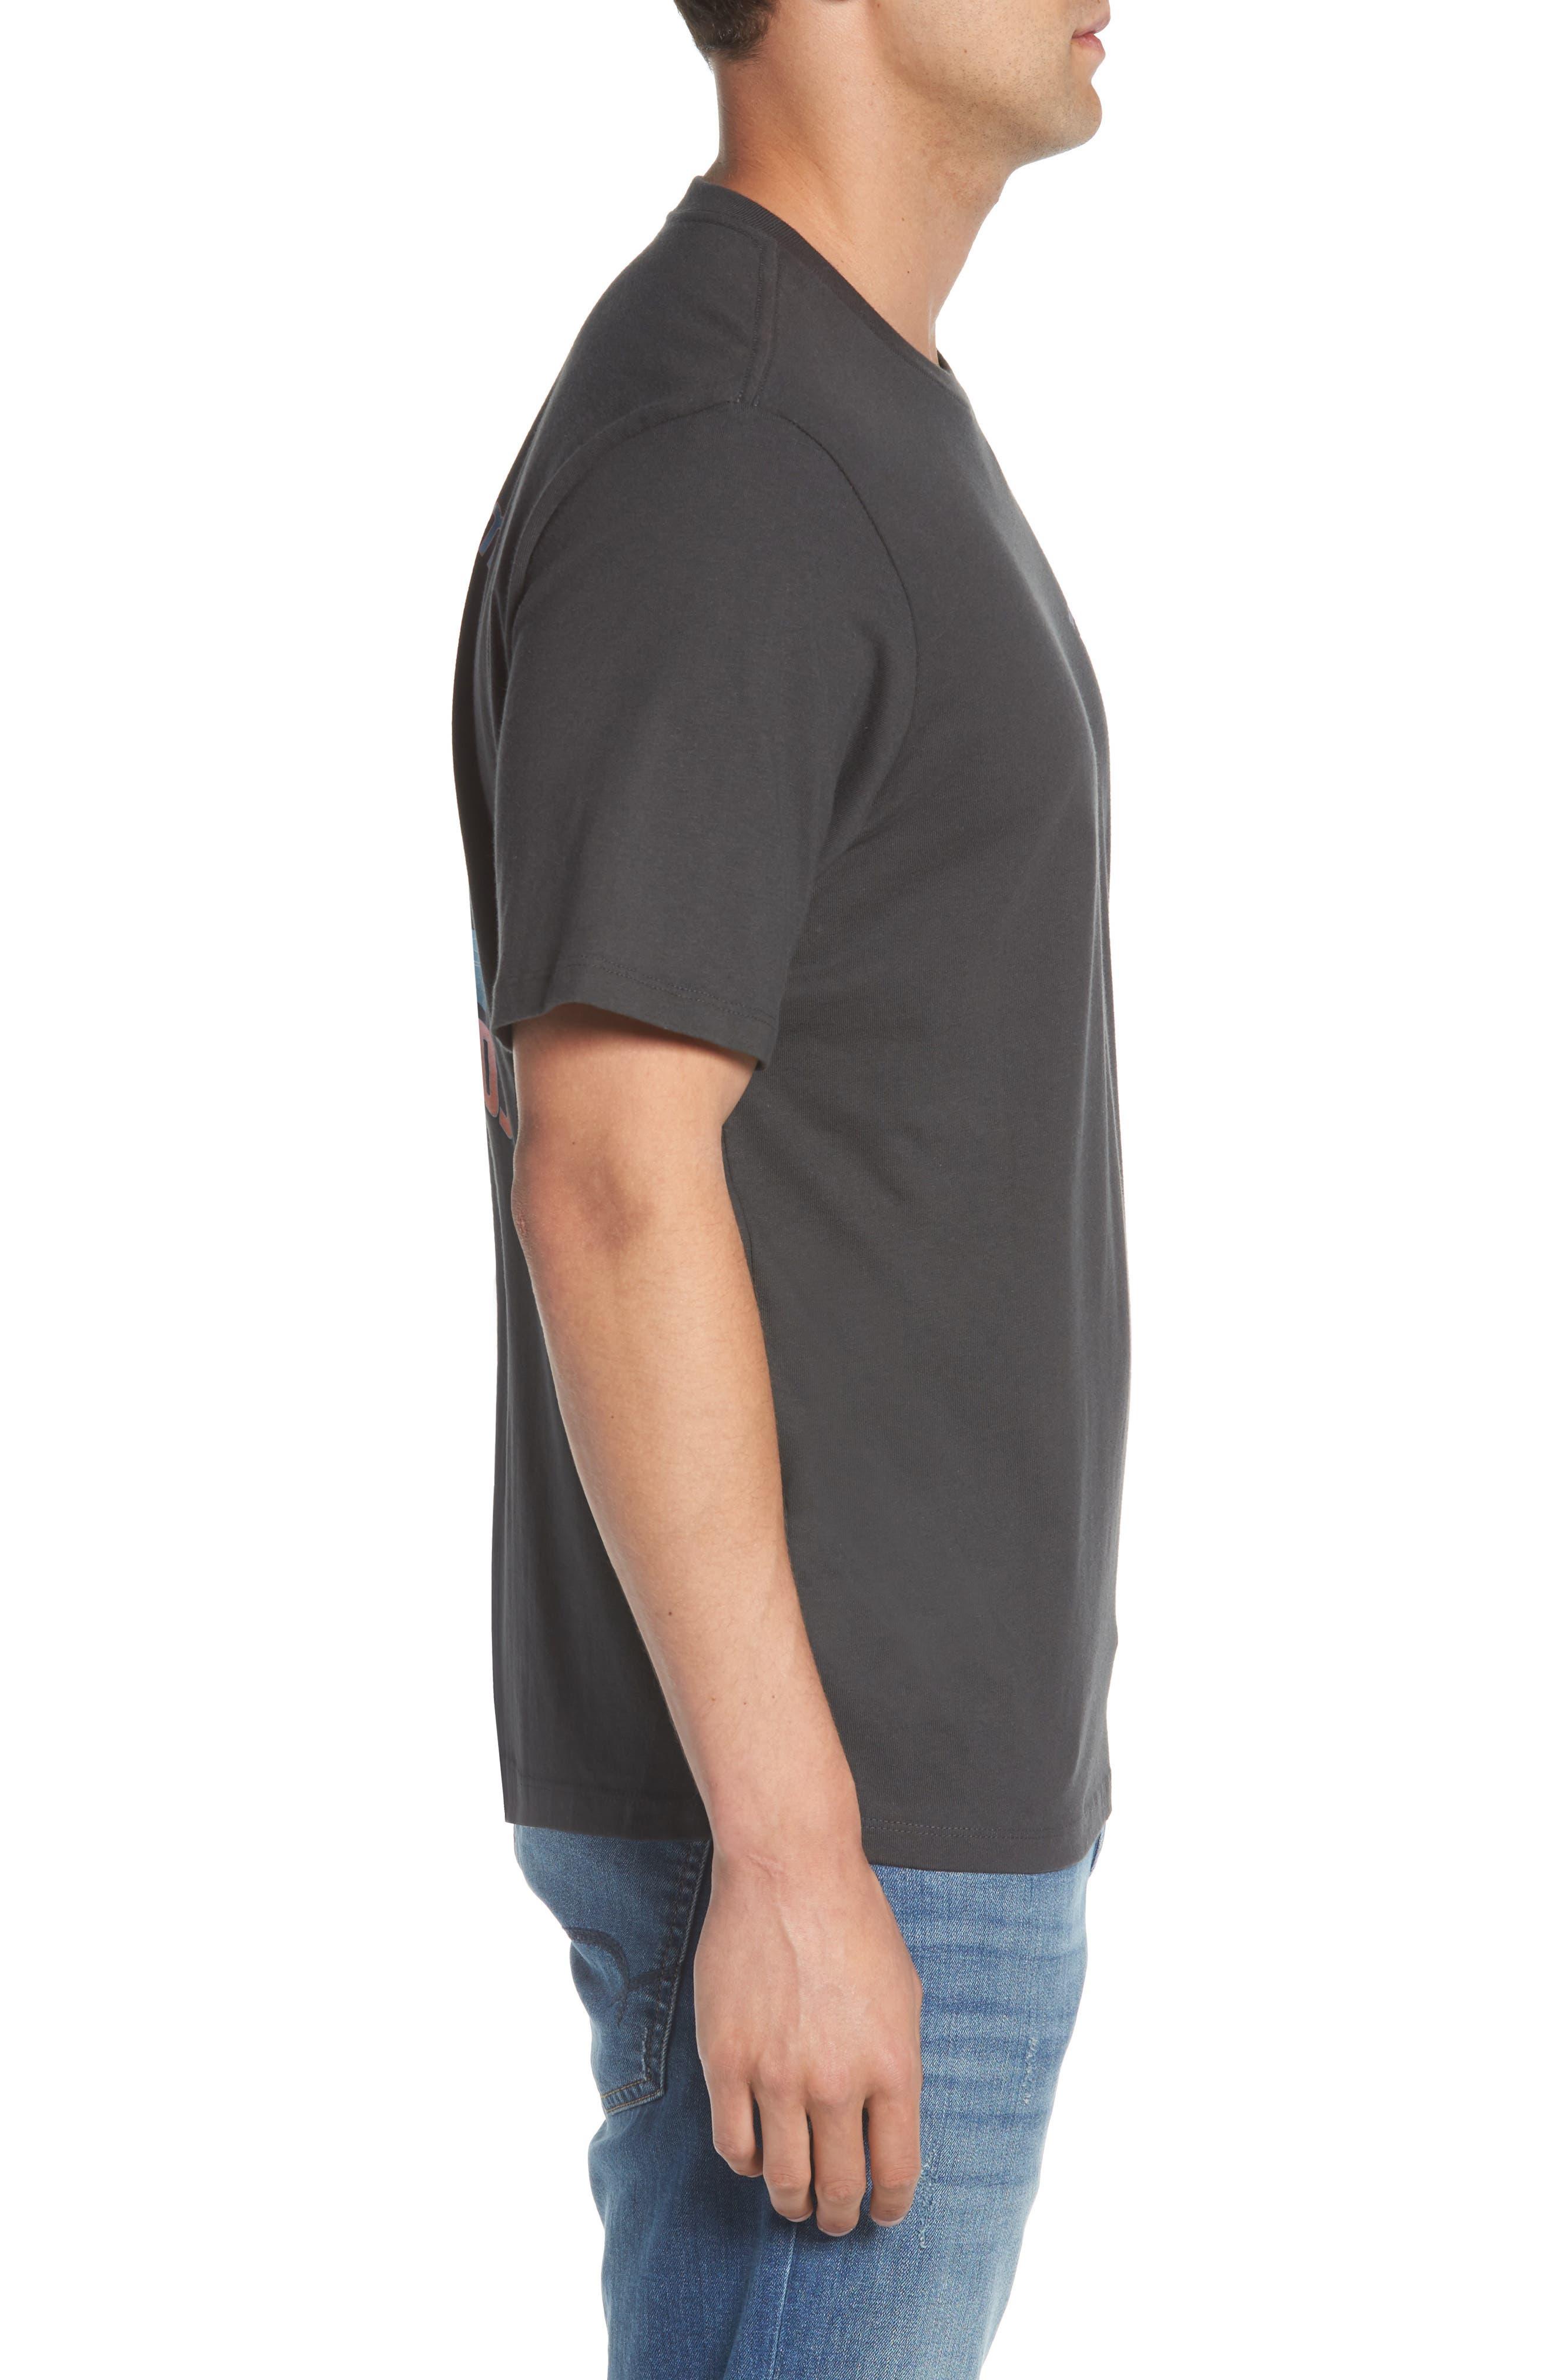 Bromingos T-Shirt,                             Alternate thumbnail 3, color,